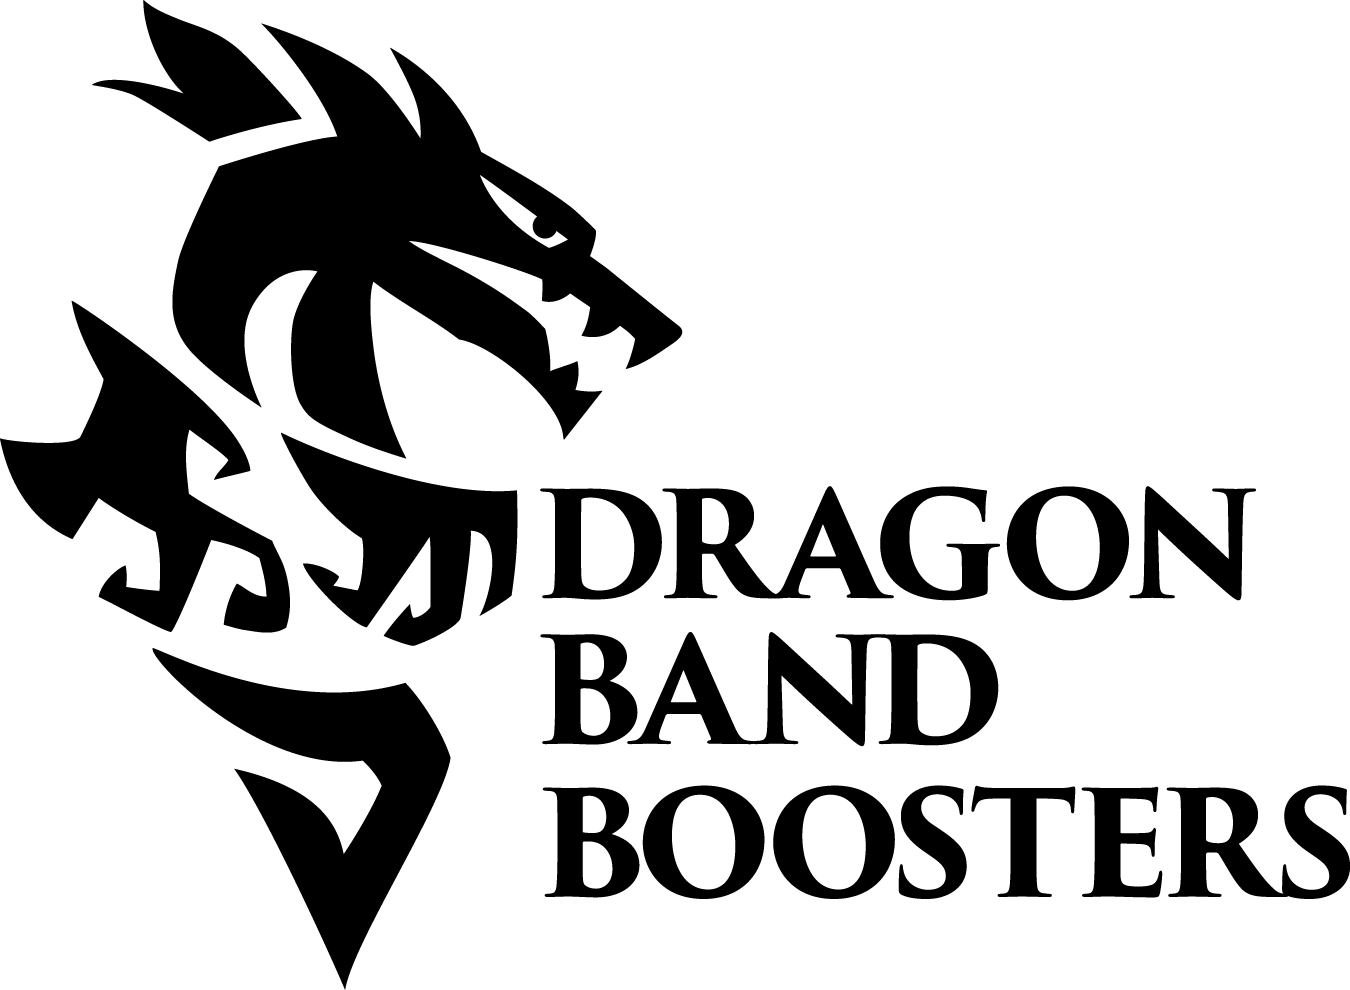 Band Boosters Logo - Download PNG fileDownload AI FileDownload PDF file